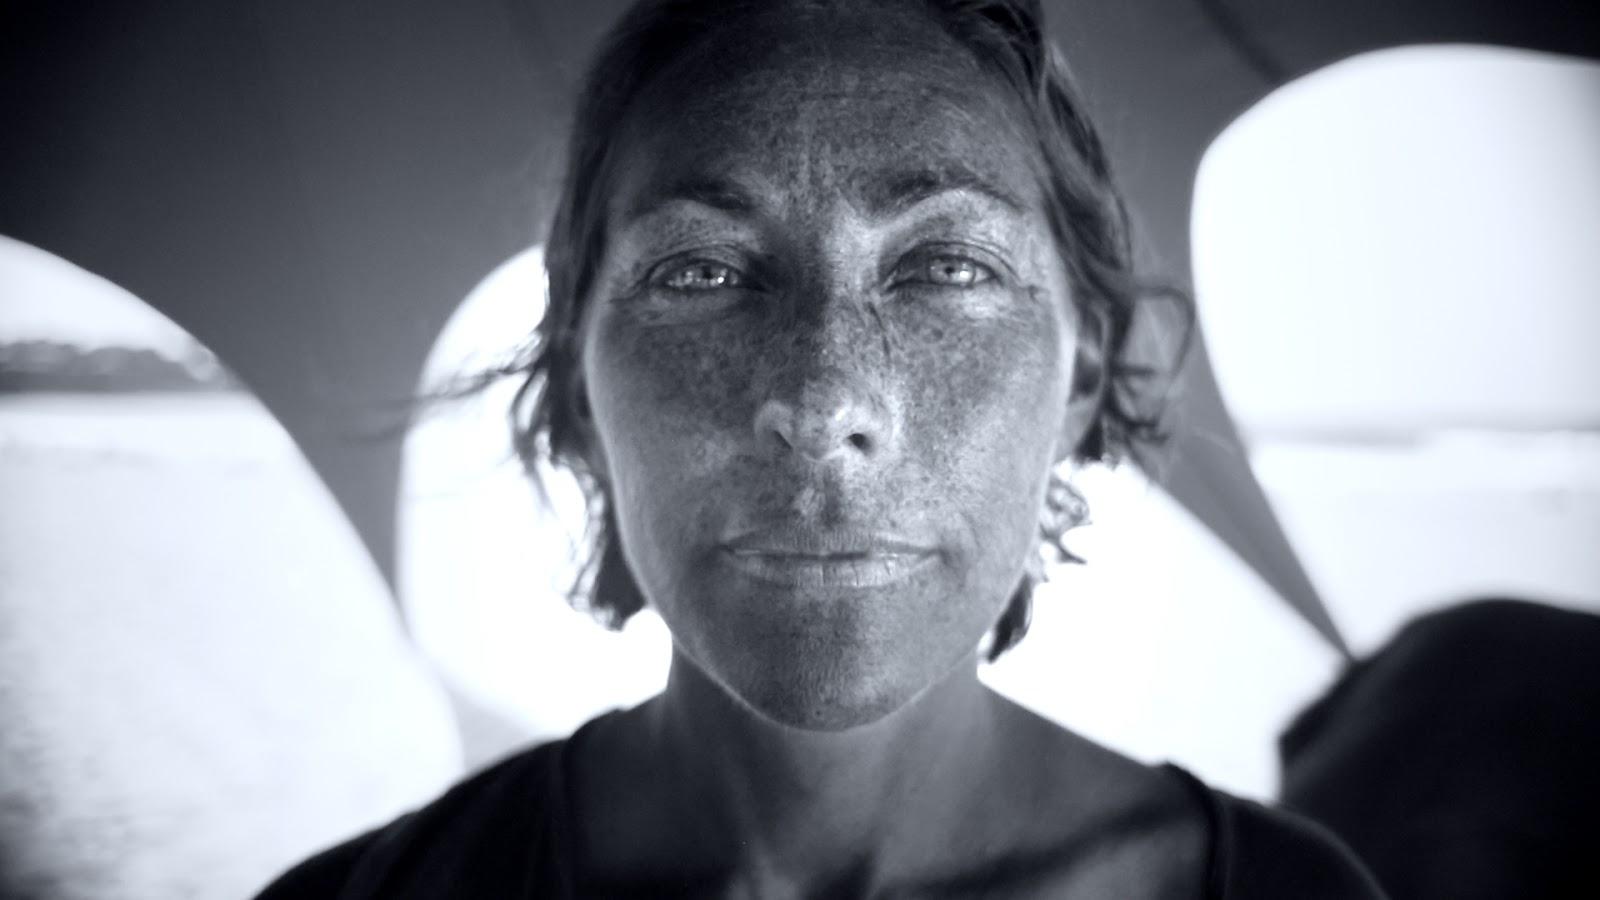 Atomlabor Blog -  Nivea präsentiert  'Take Care Out There' mit Thomas Leveritt